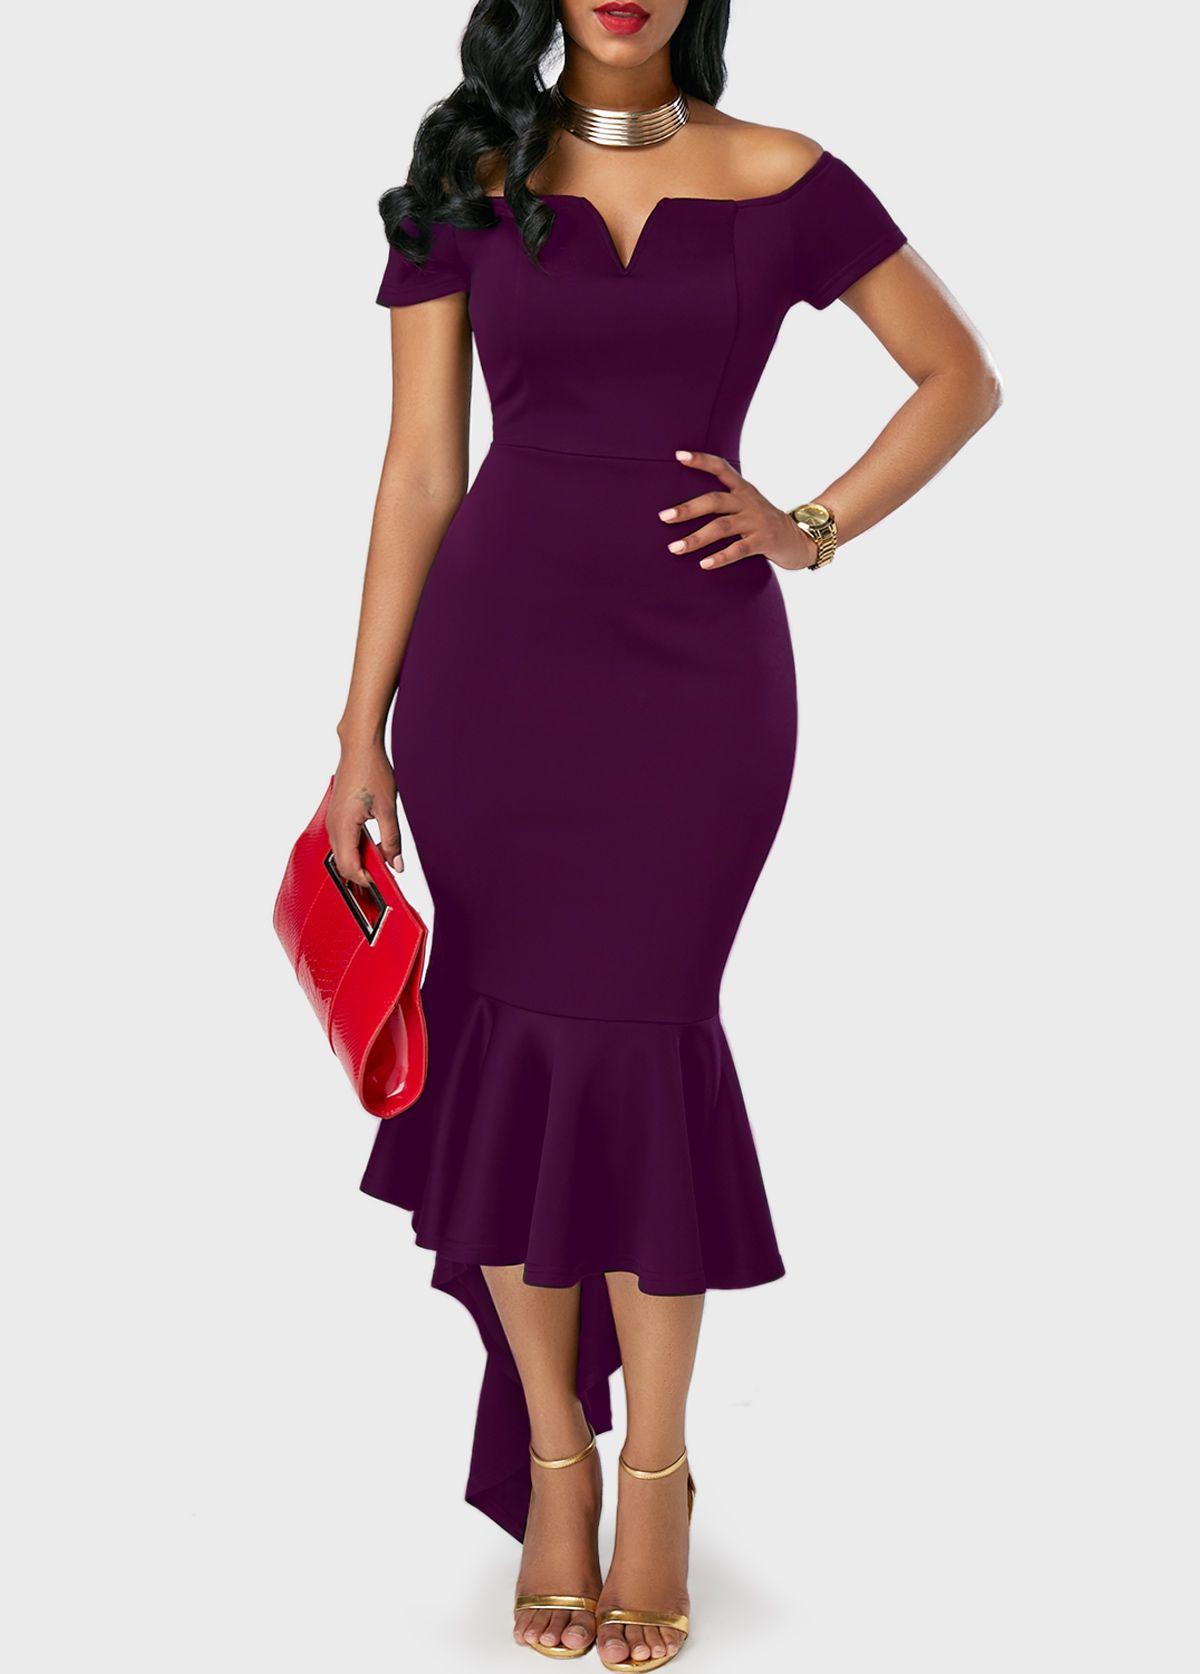 74564719d663 Split Neck Peplum Hem Purple Bardot Dress | Rosewe.com - USD $33.08 ...